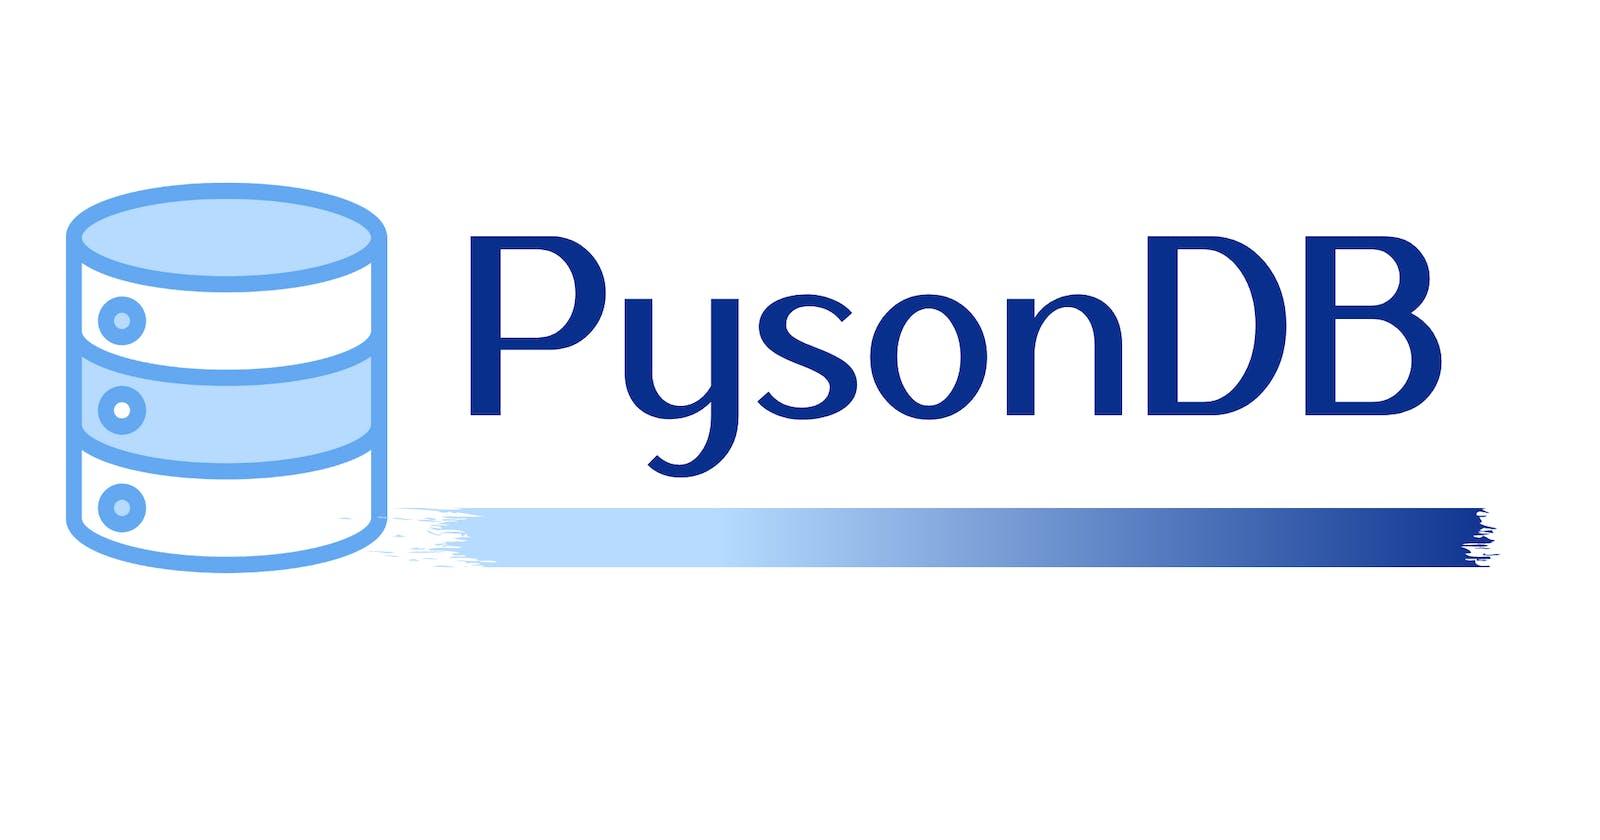 PysonDB - A JSON based lightweight Database for Python.